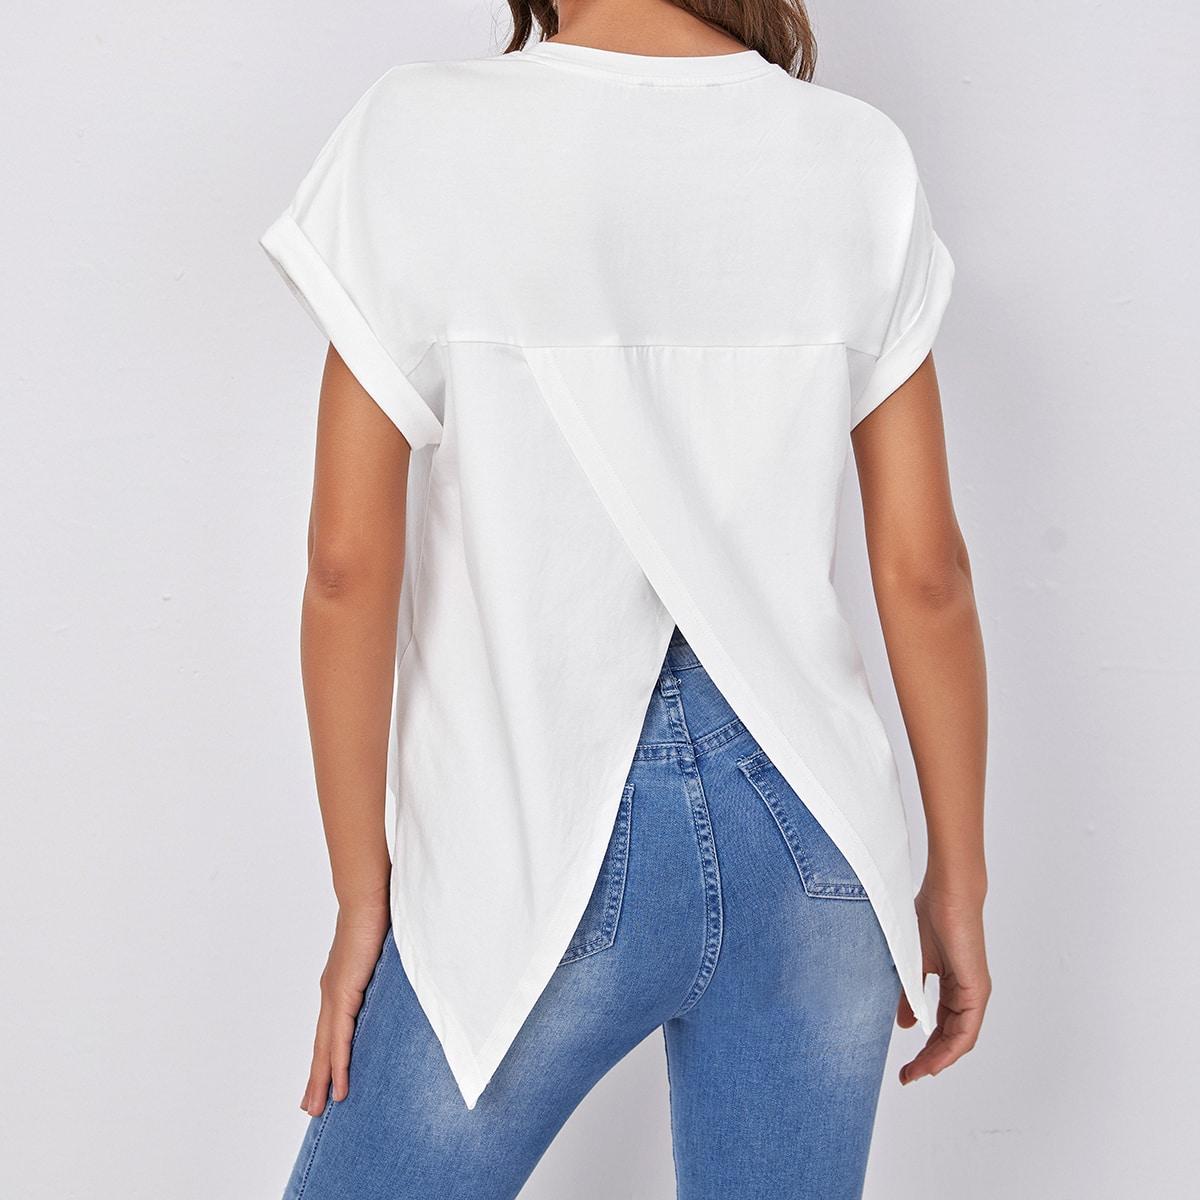 Однотонная футболка SheIn swtee07210112164